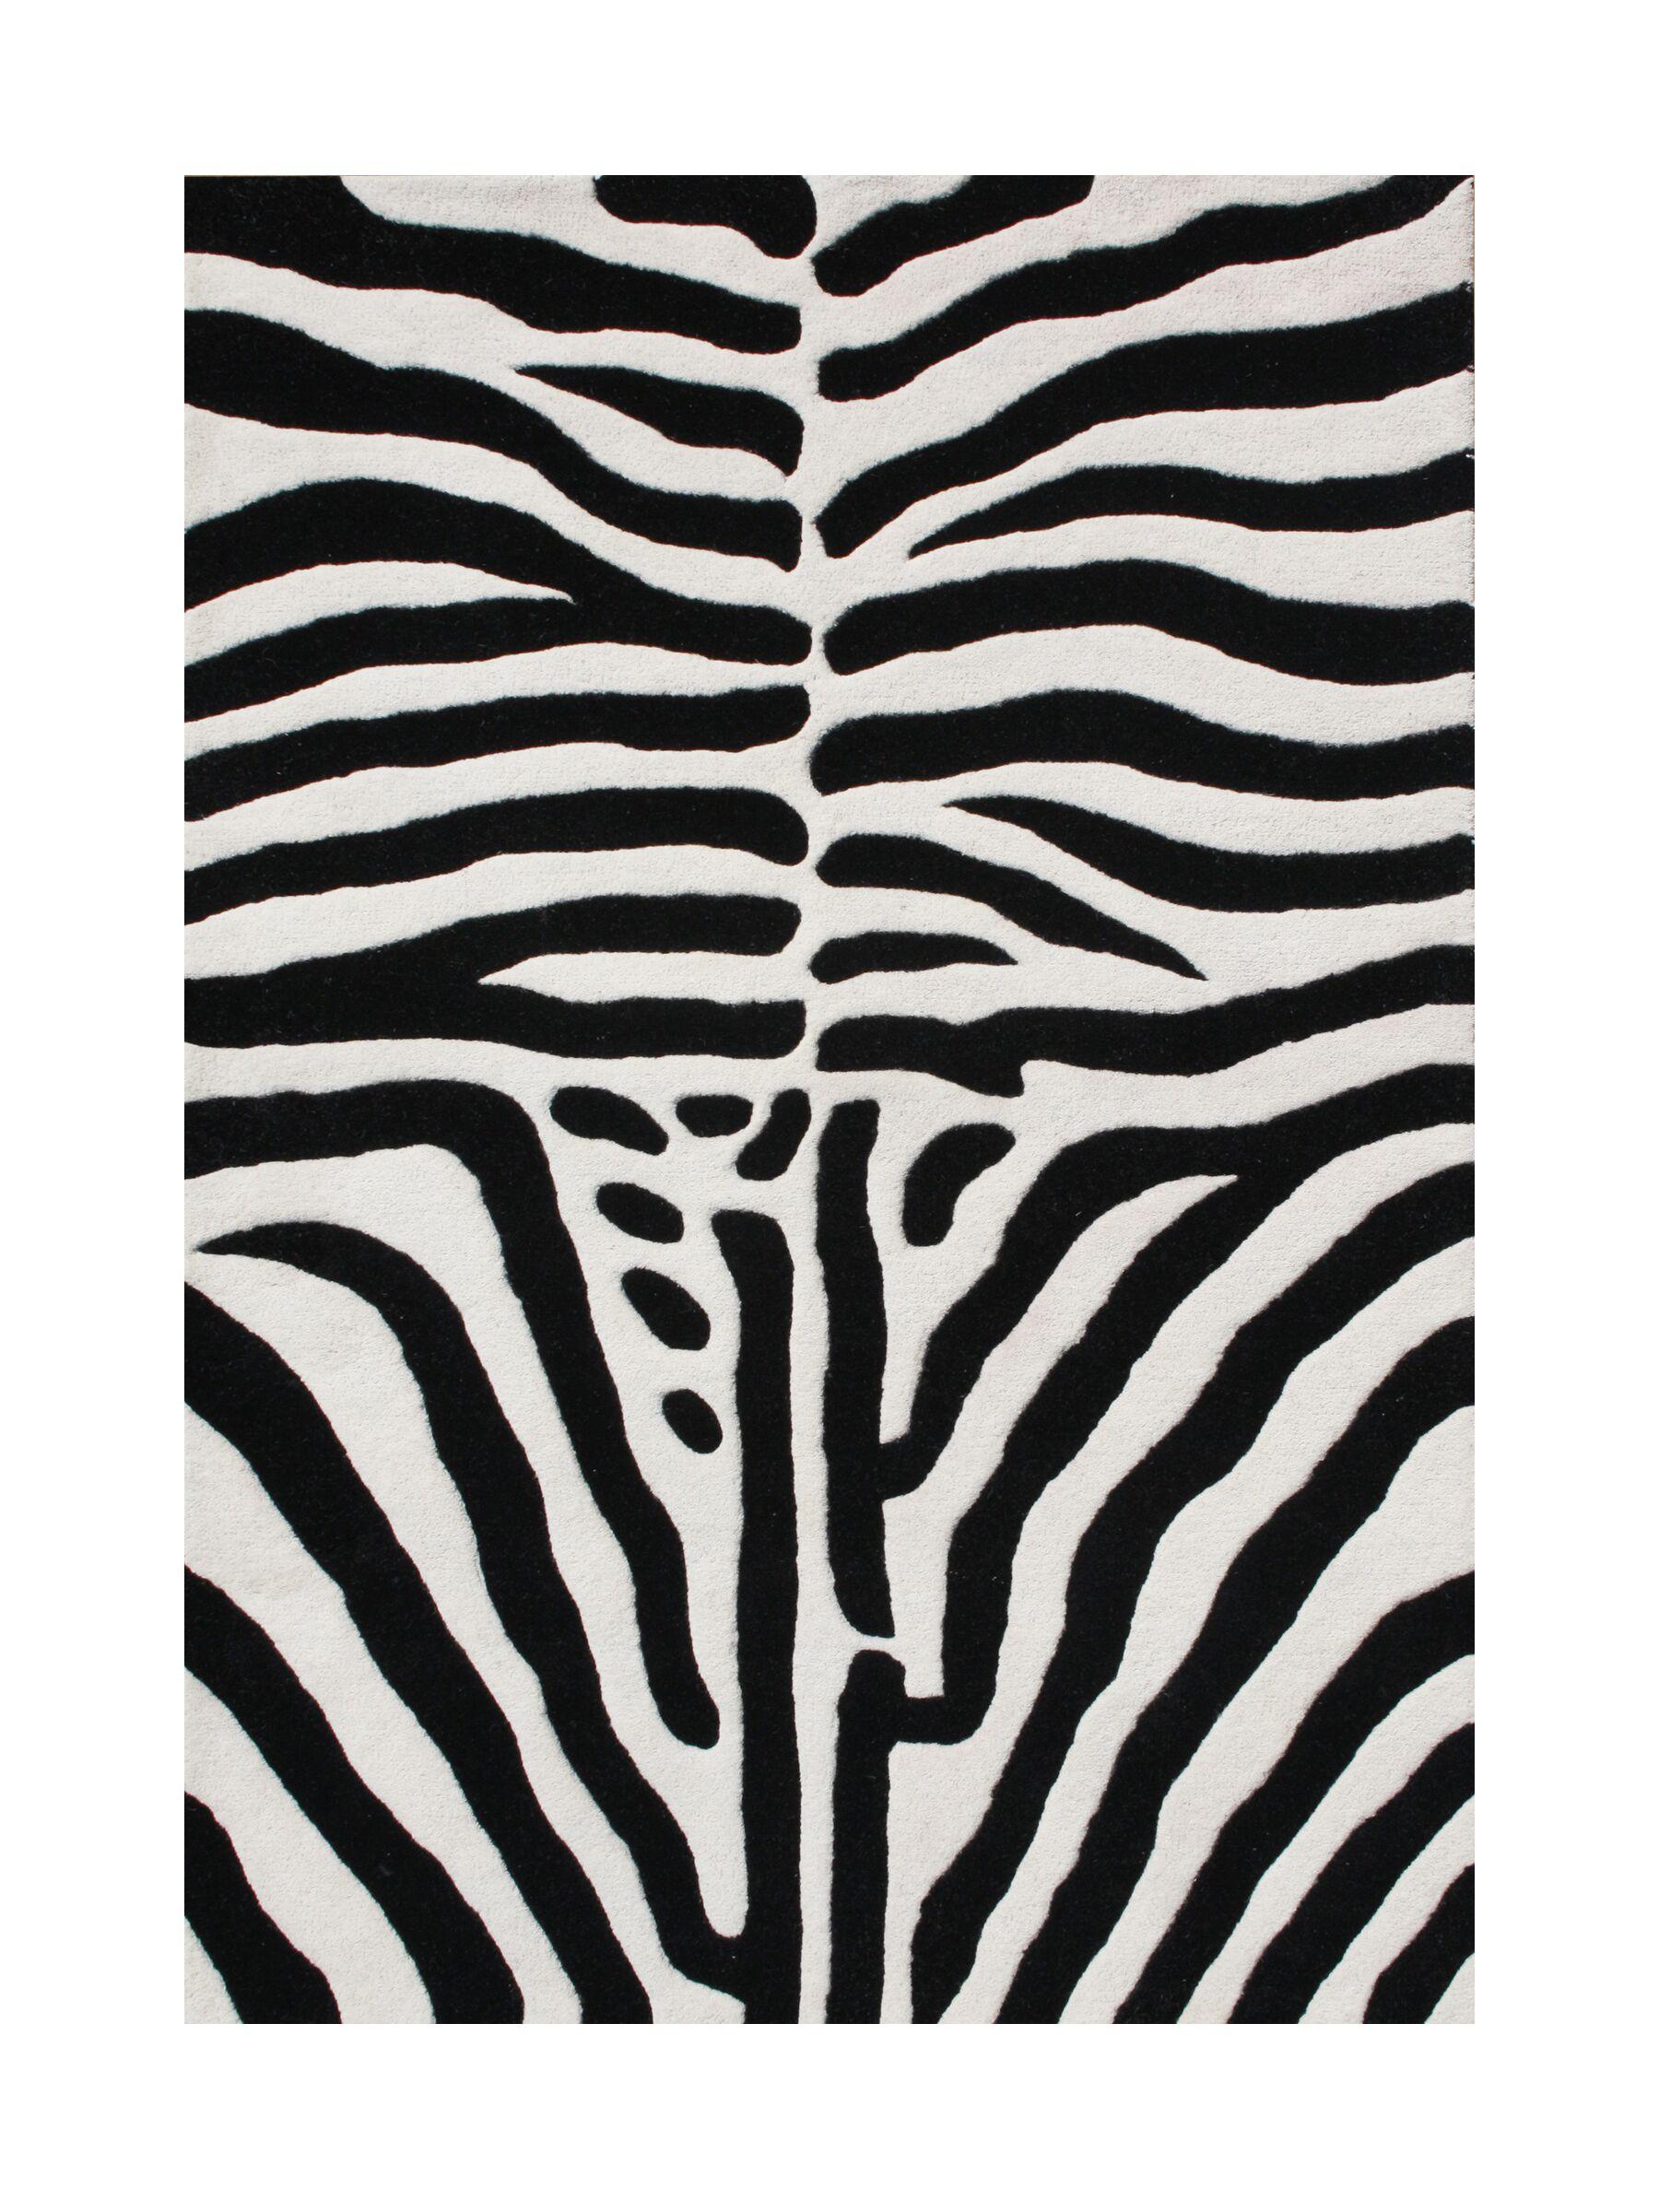 Walton Hand-Tufted Black/White Area Rug Rug Size: Rectangle 5' x 8'